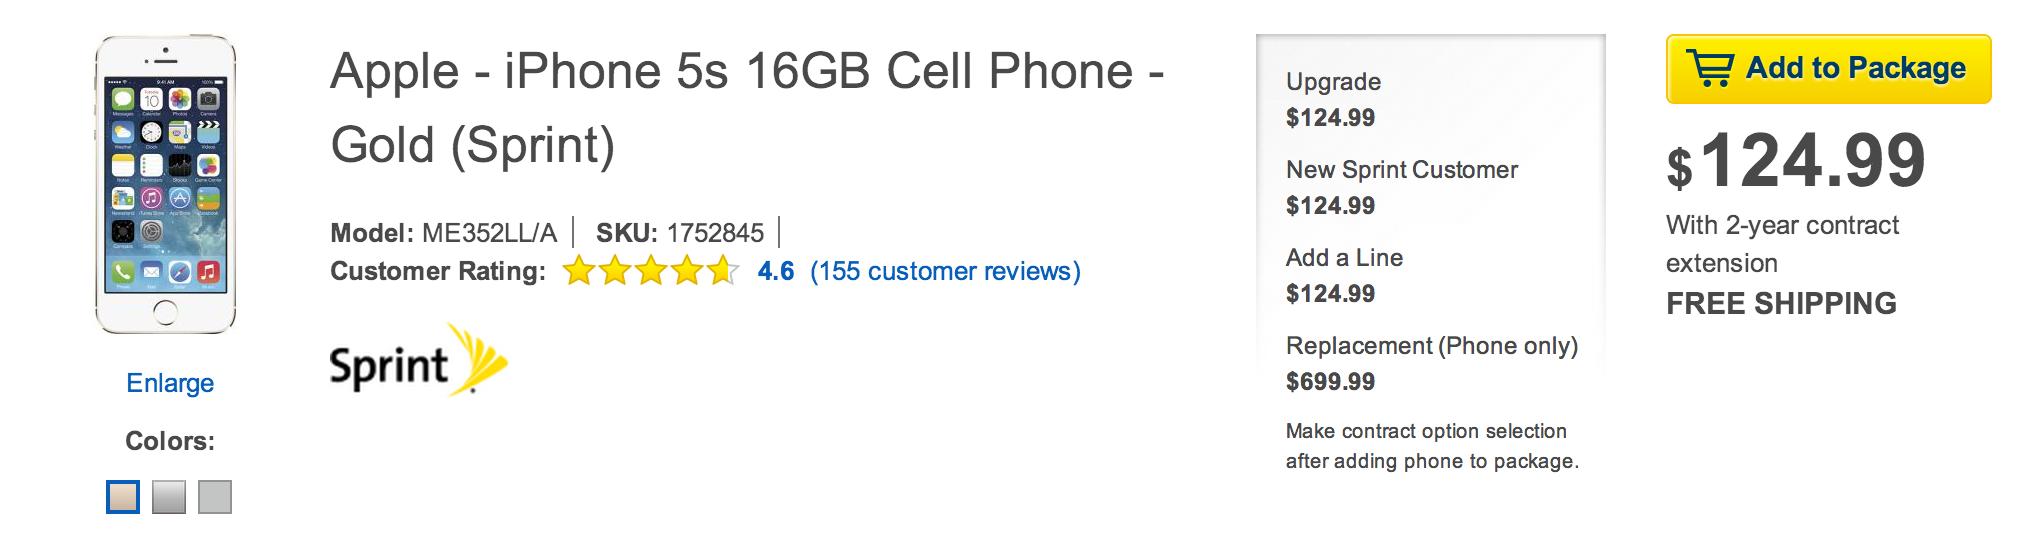 iPhone-5S-bestbuy